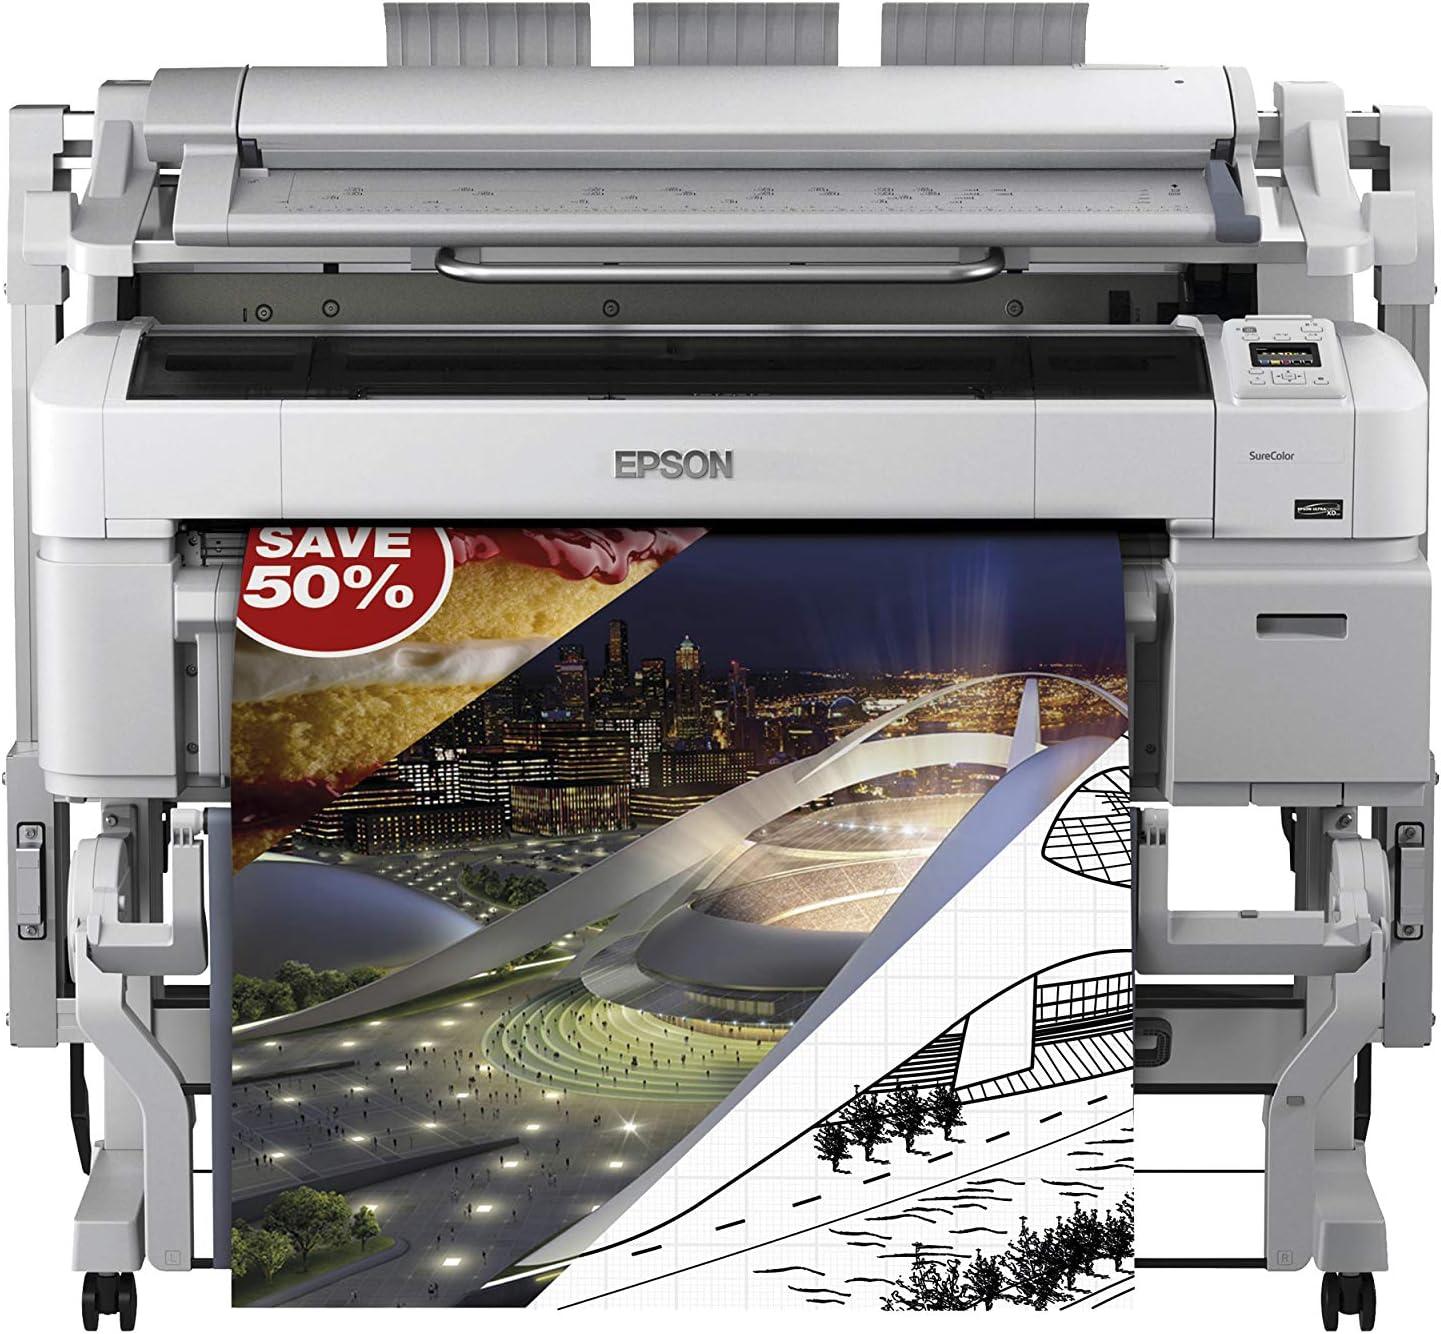 Epson SureColor SC-T5200 PS MFP - Impresora de gran formato (2880 x 1440 DPI, Inyección de tinta, ESC/P-R,HP-GL/2,PostScript 3, Cian, Magenta, Negro mate, Foto negro, Amarillo, A0 (841 x 1189 mm), 0.08 -